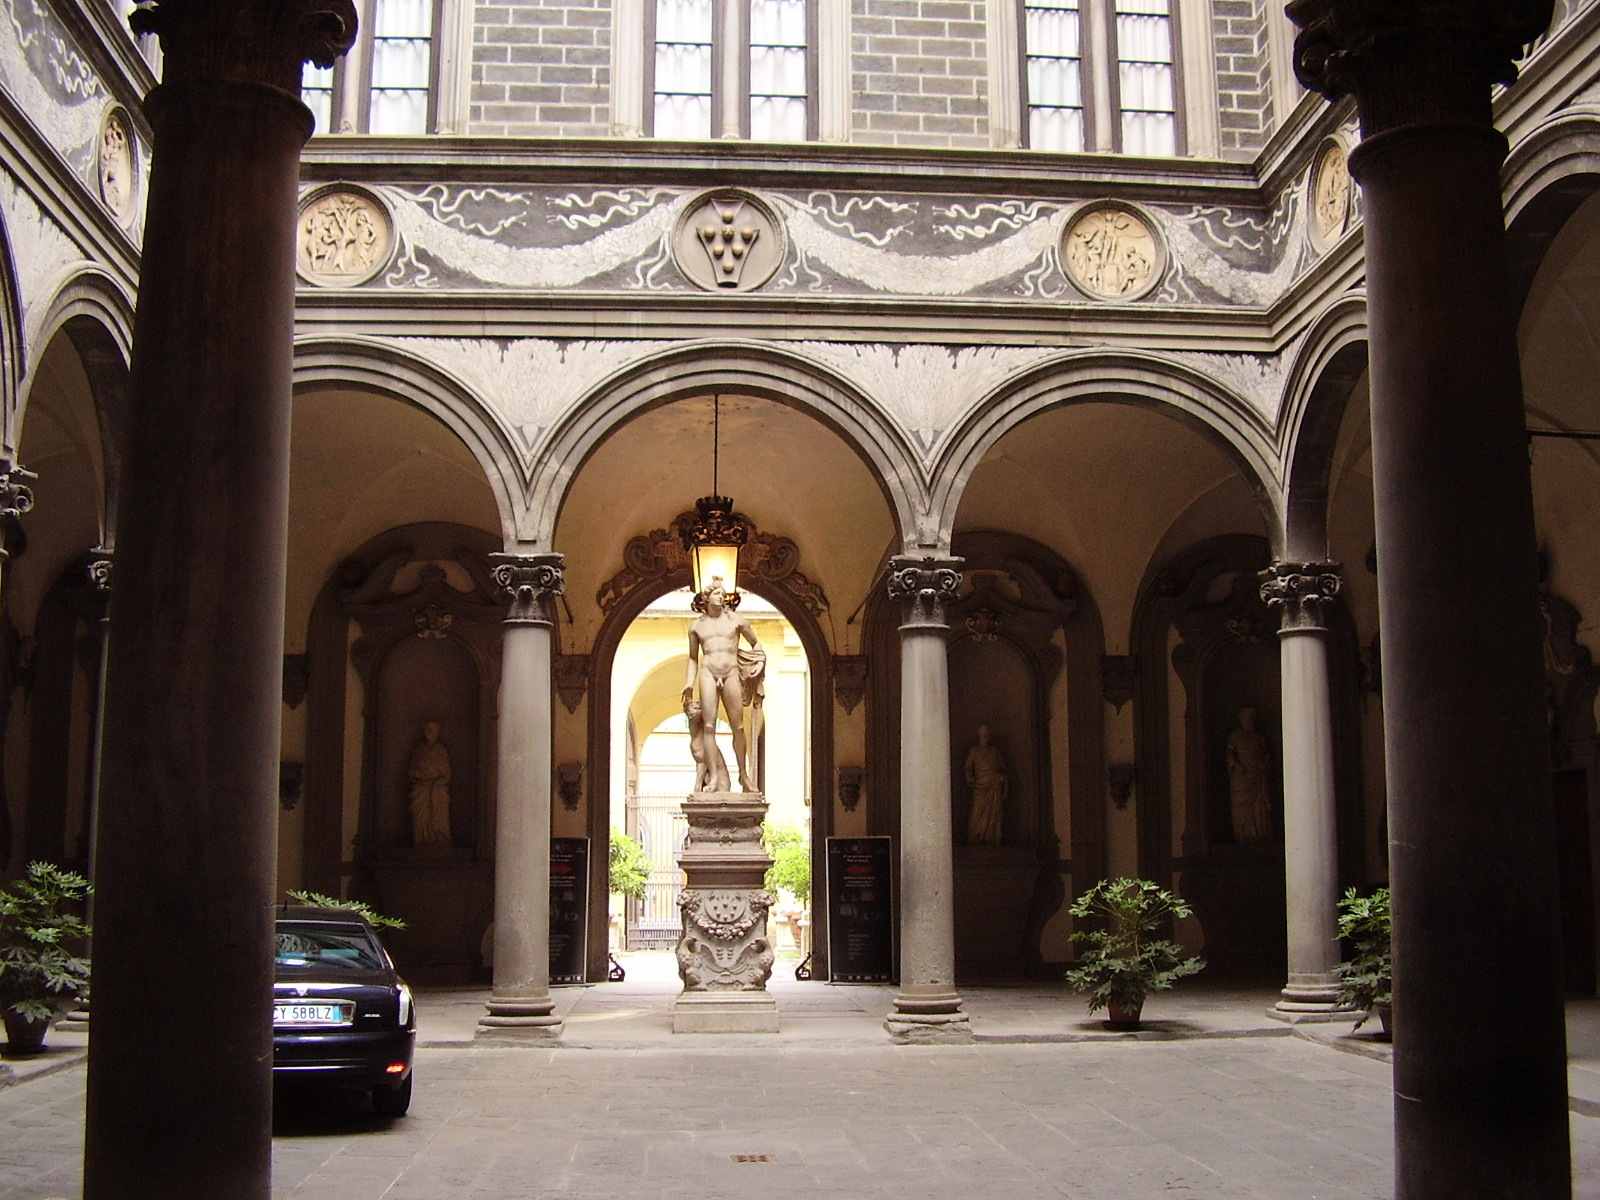 florencia palazzo medici riccardi: